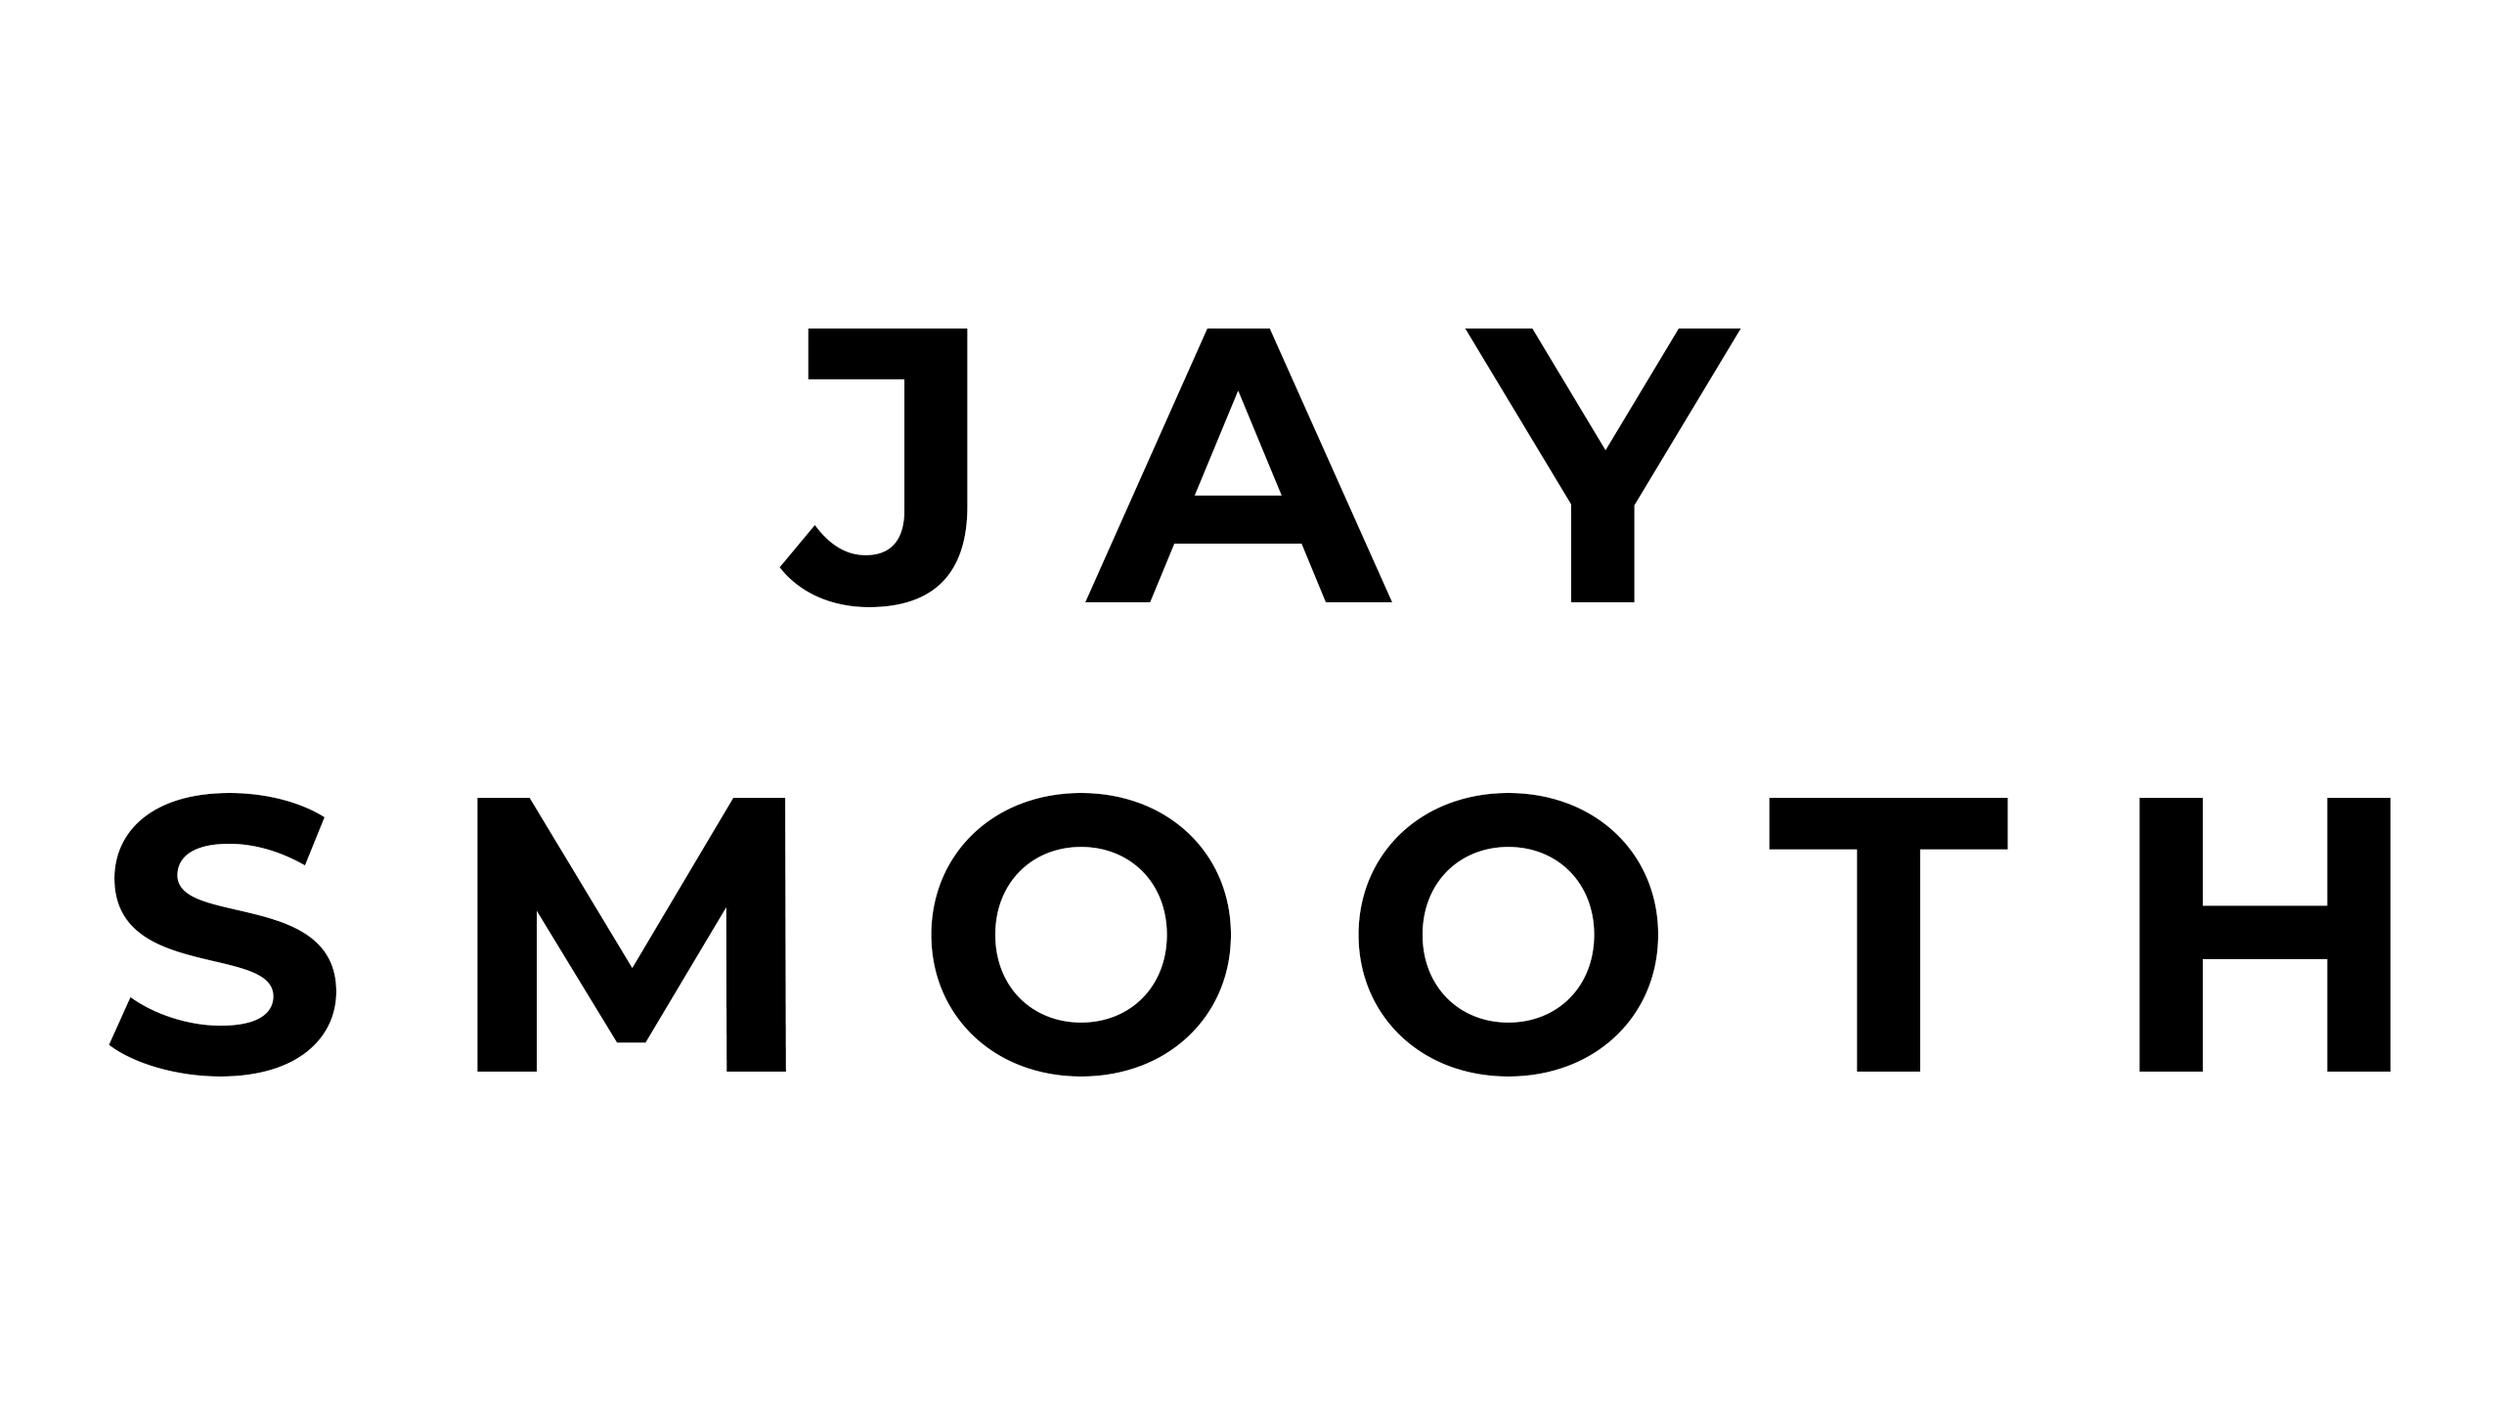 Jay Smooth